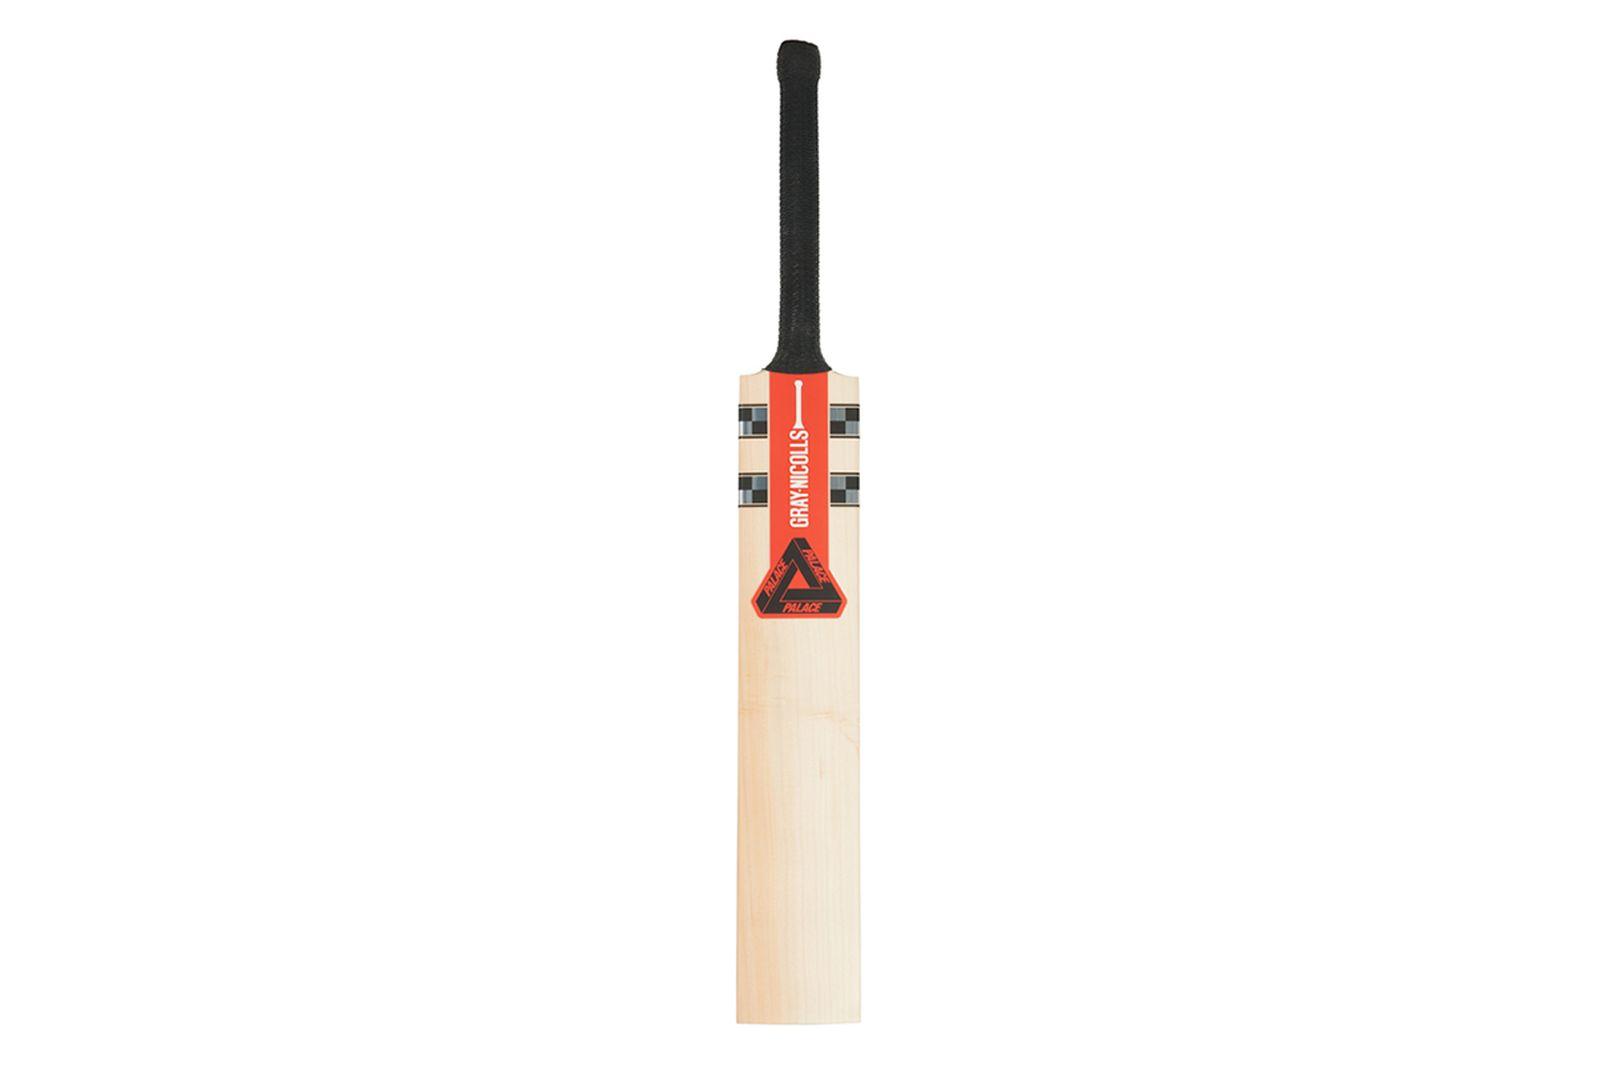 palace-fall-winter-2021-cricket-bat-ball- (7)